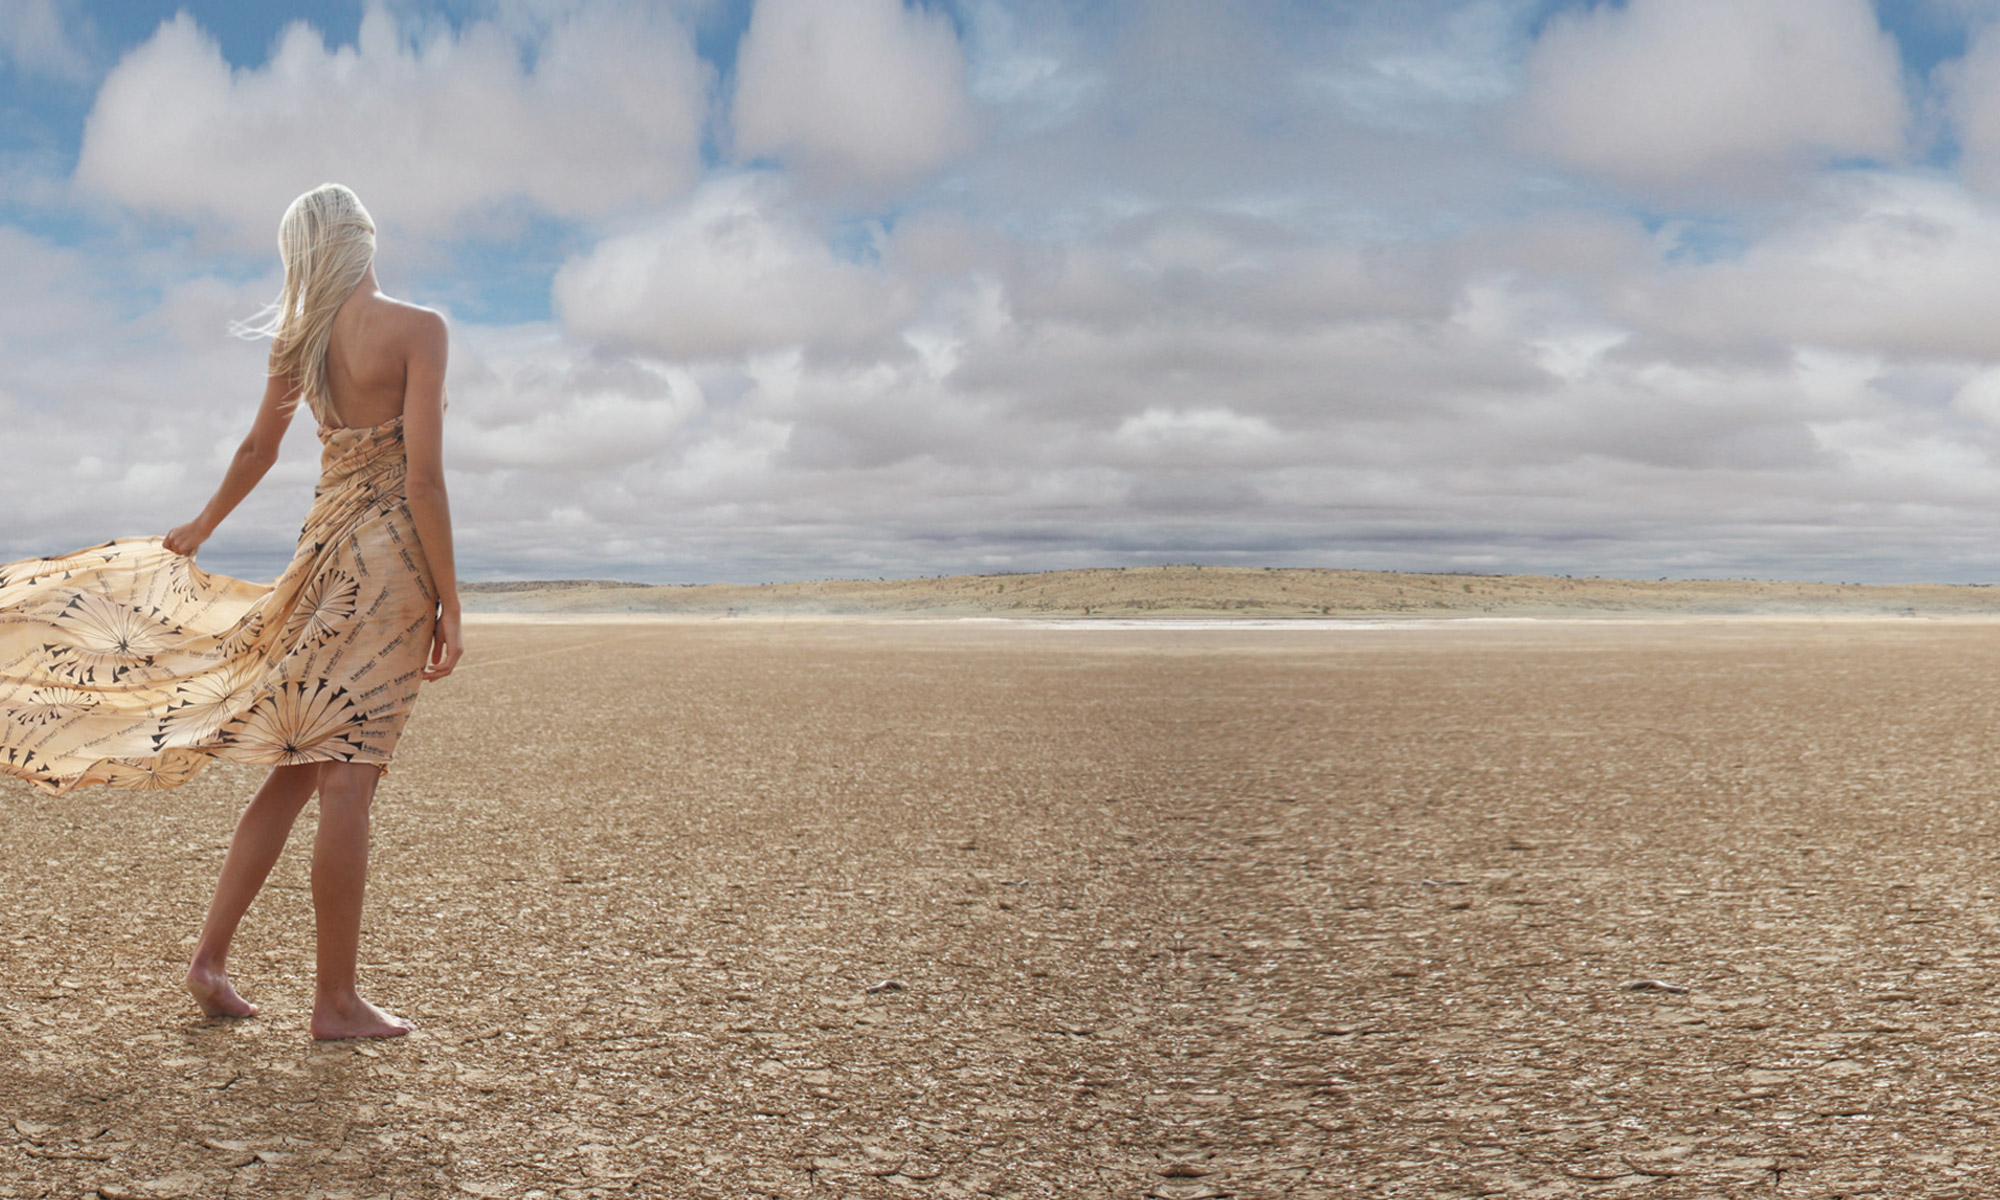 Kalahari Background